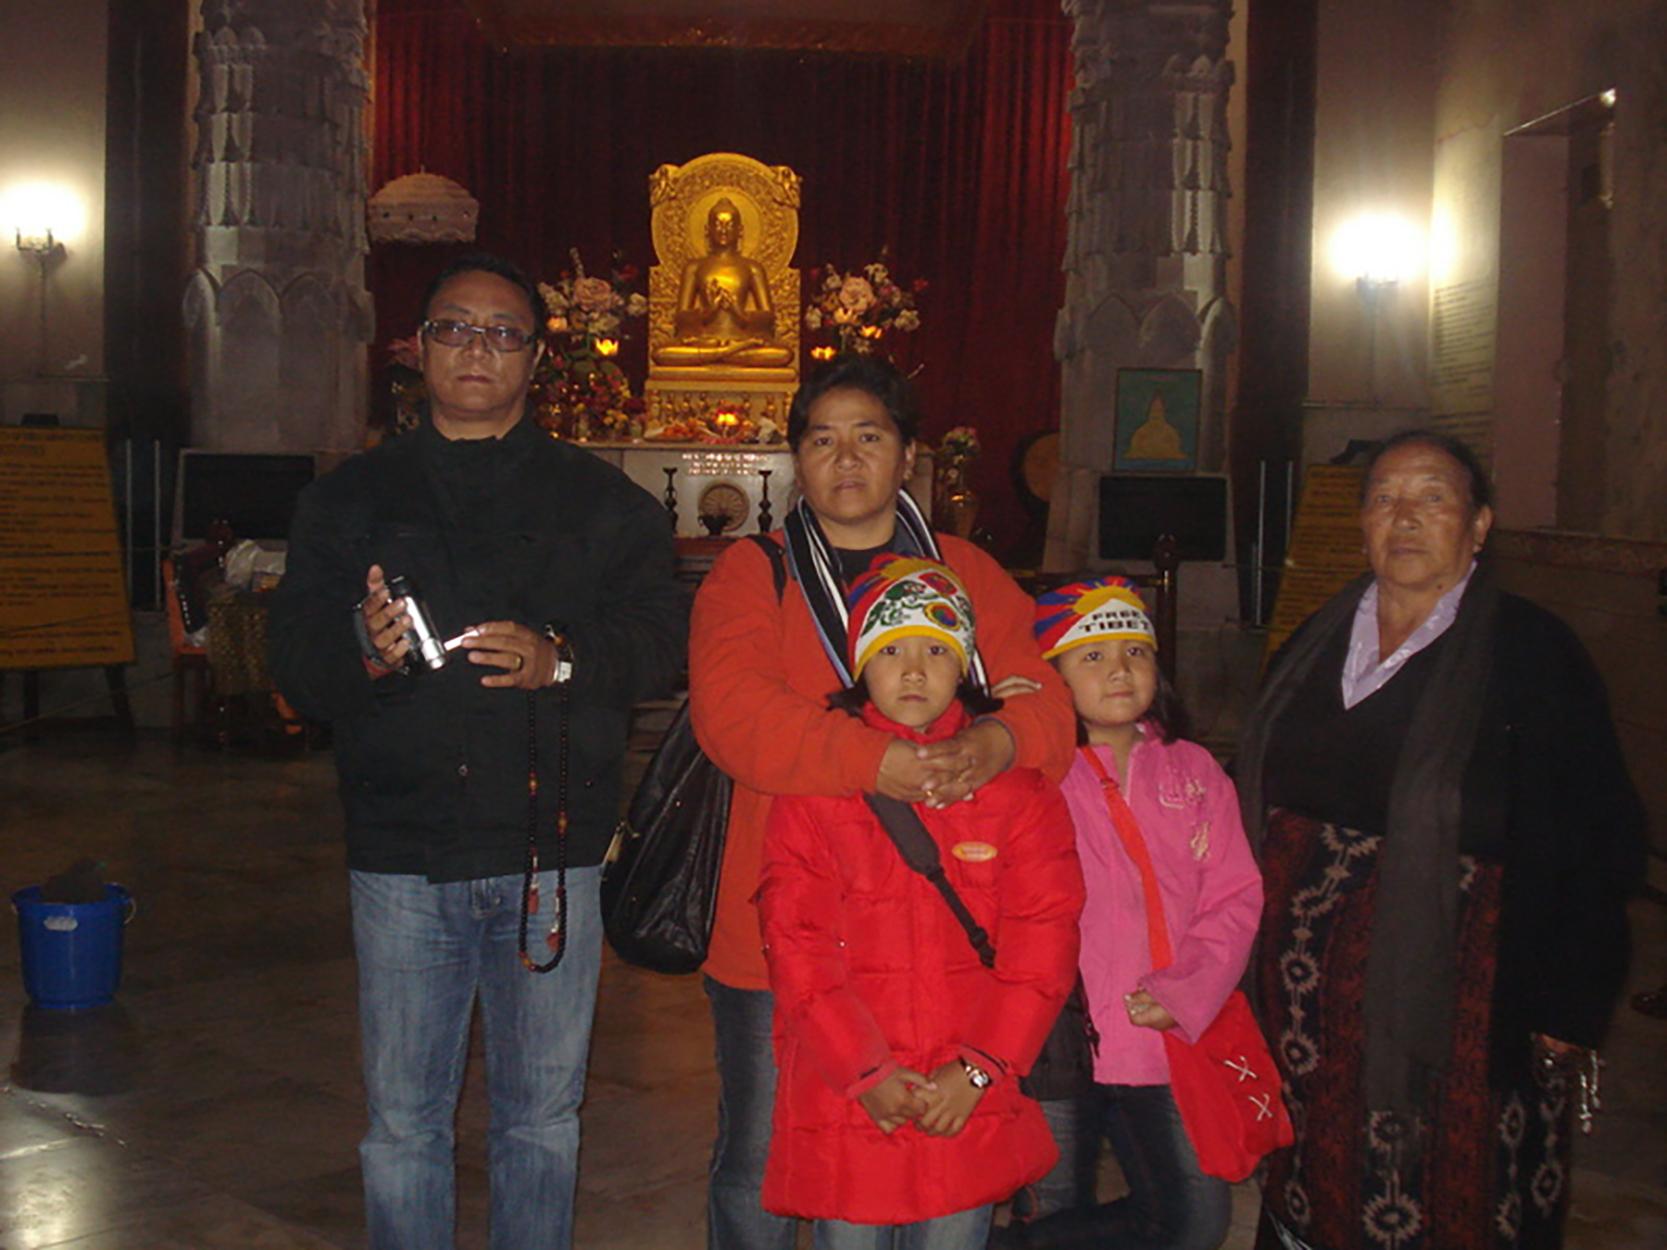 Mr. Palden Dhondup with his family during their pilgrimage in Sarnath, Uttar Pradesh, 2008.